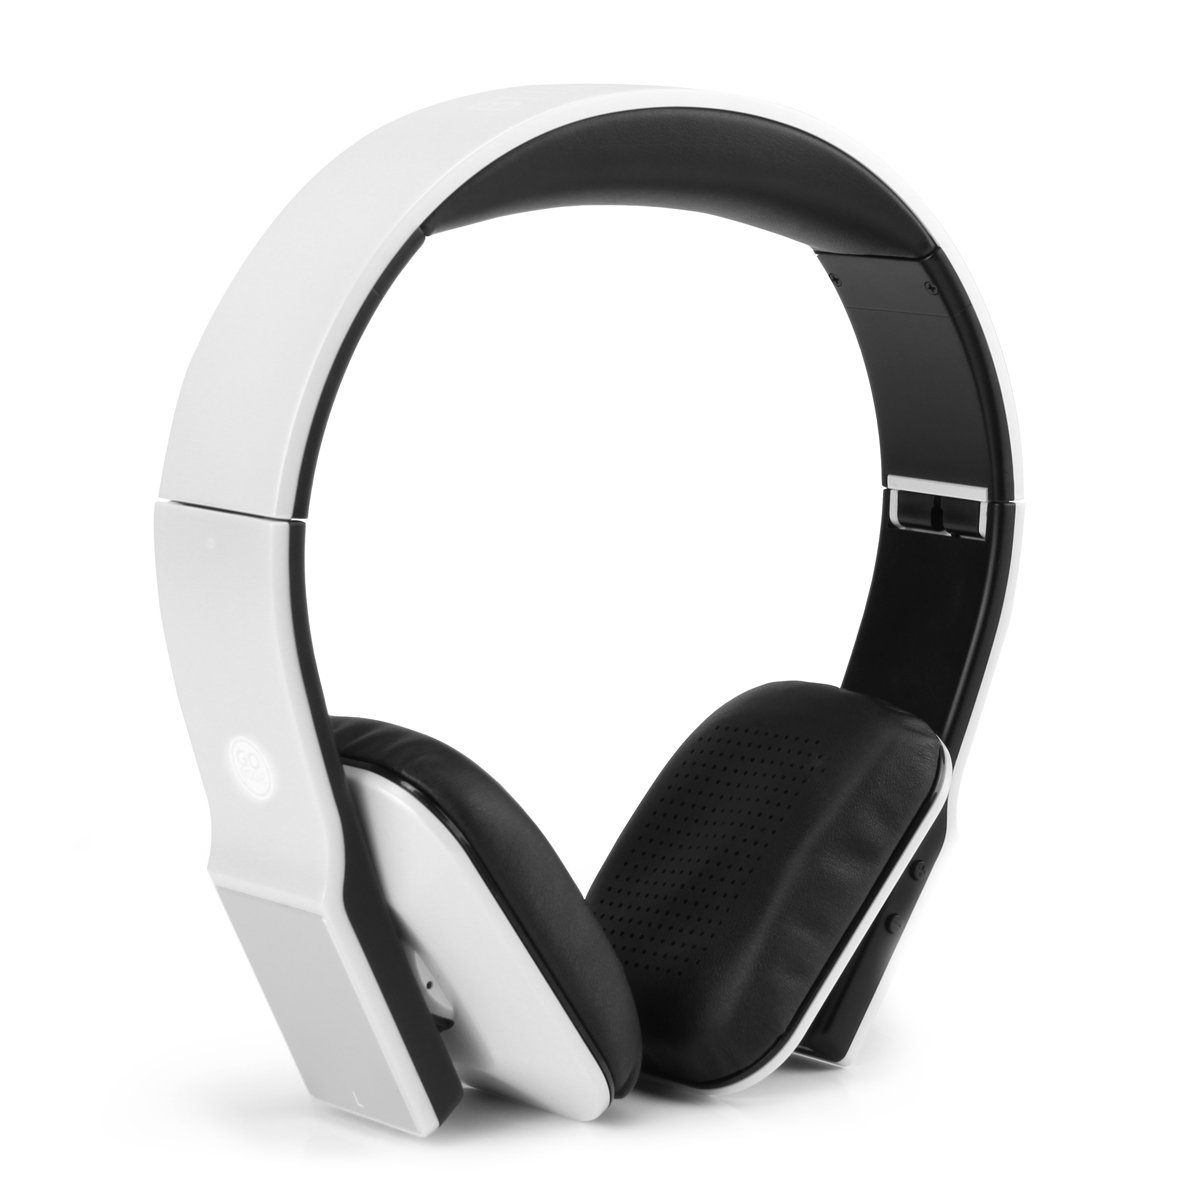 GOgroove BlueVIBE DLX Hi-Def Over-Ear Bluetooth Headphones - Ultra Premium White